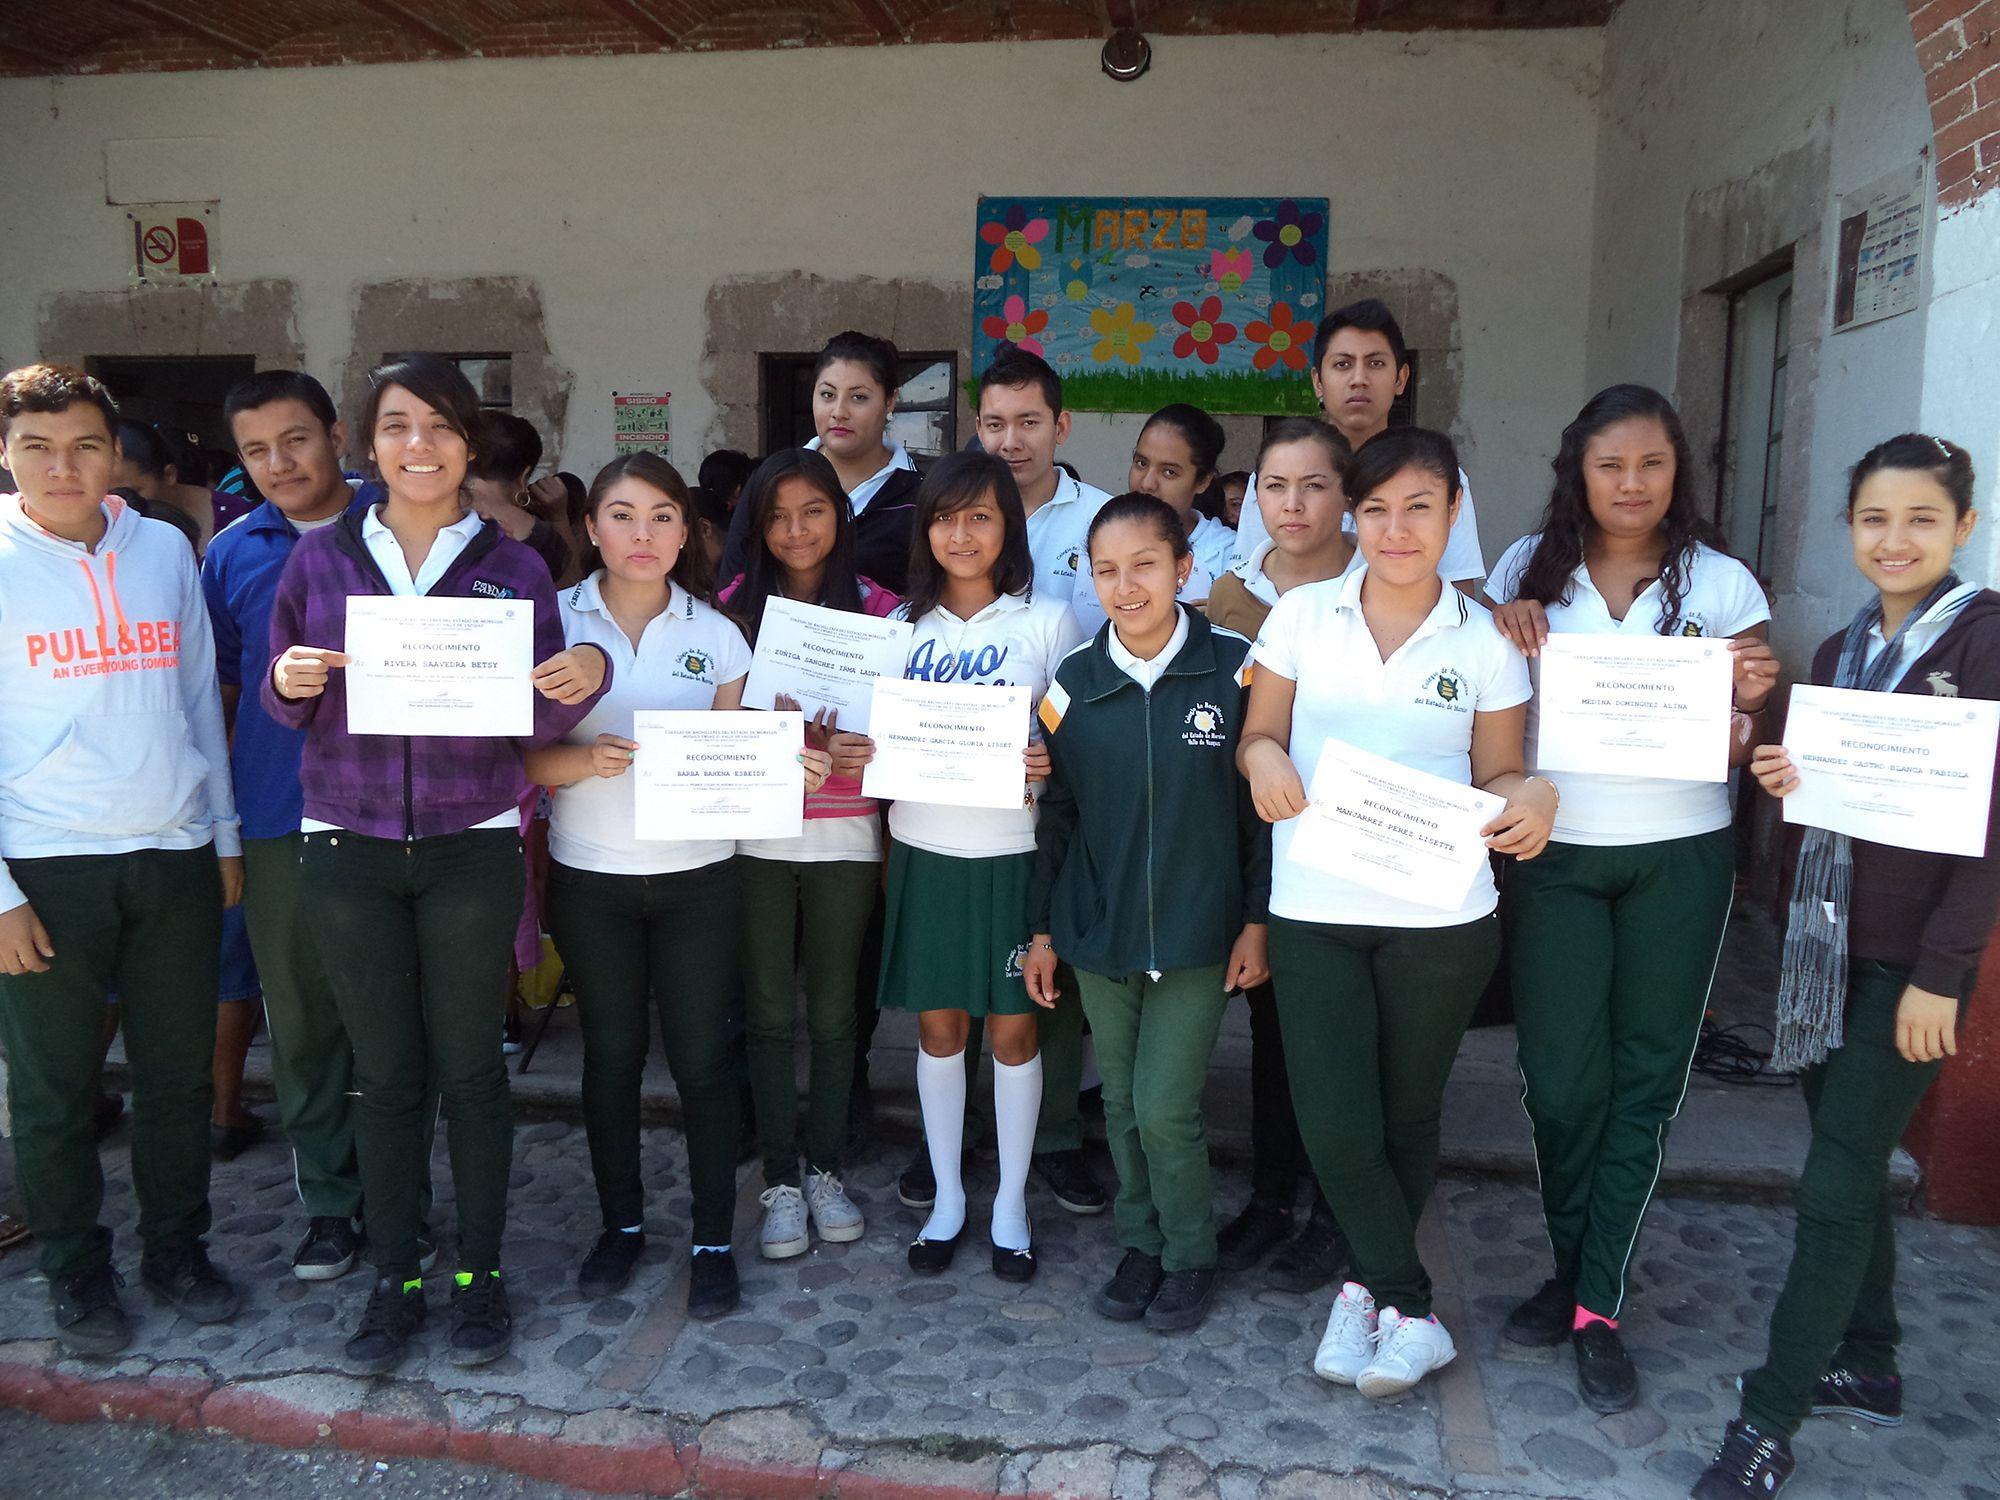 #EMSAD01ValladeVázquez entregó boletas del primer parcial del semestre 2015-A. #juventudcultayproductiva #SerBachillerEsUnOrgullo